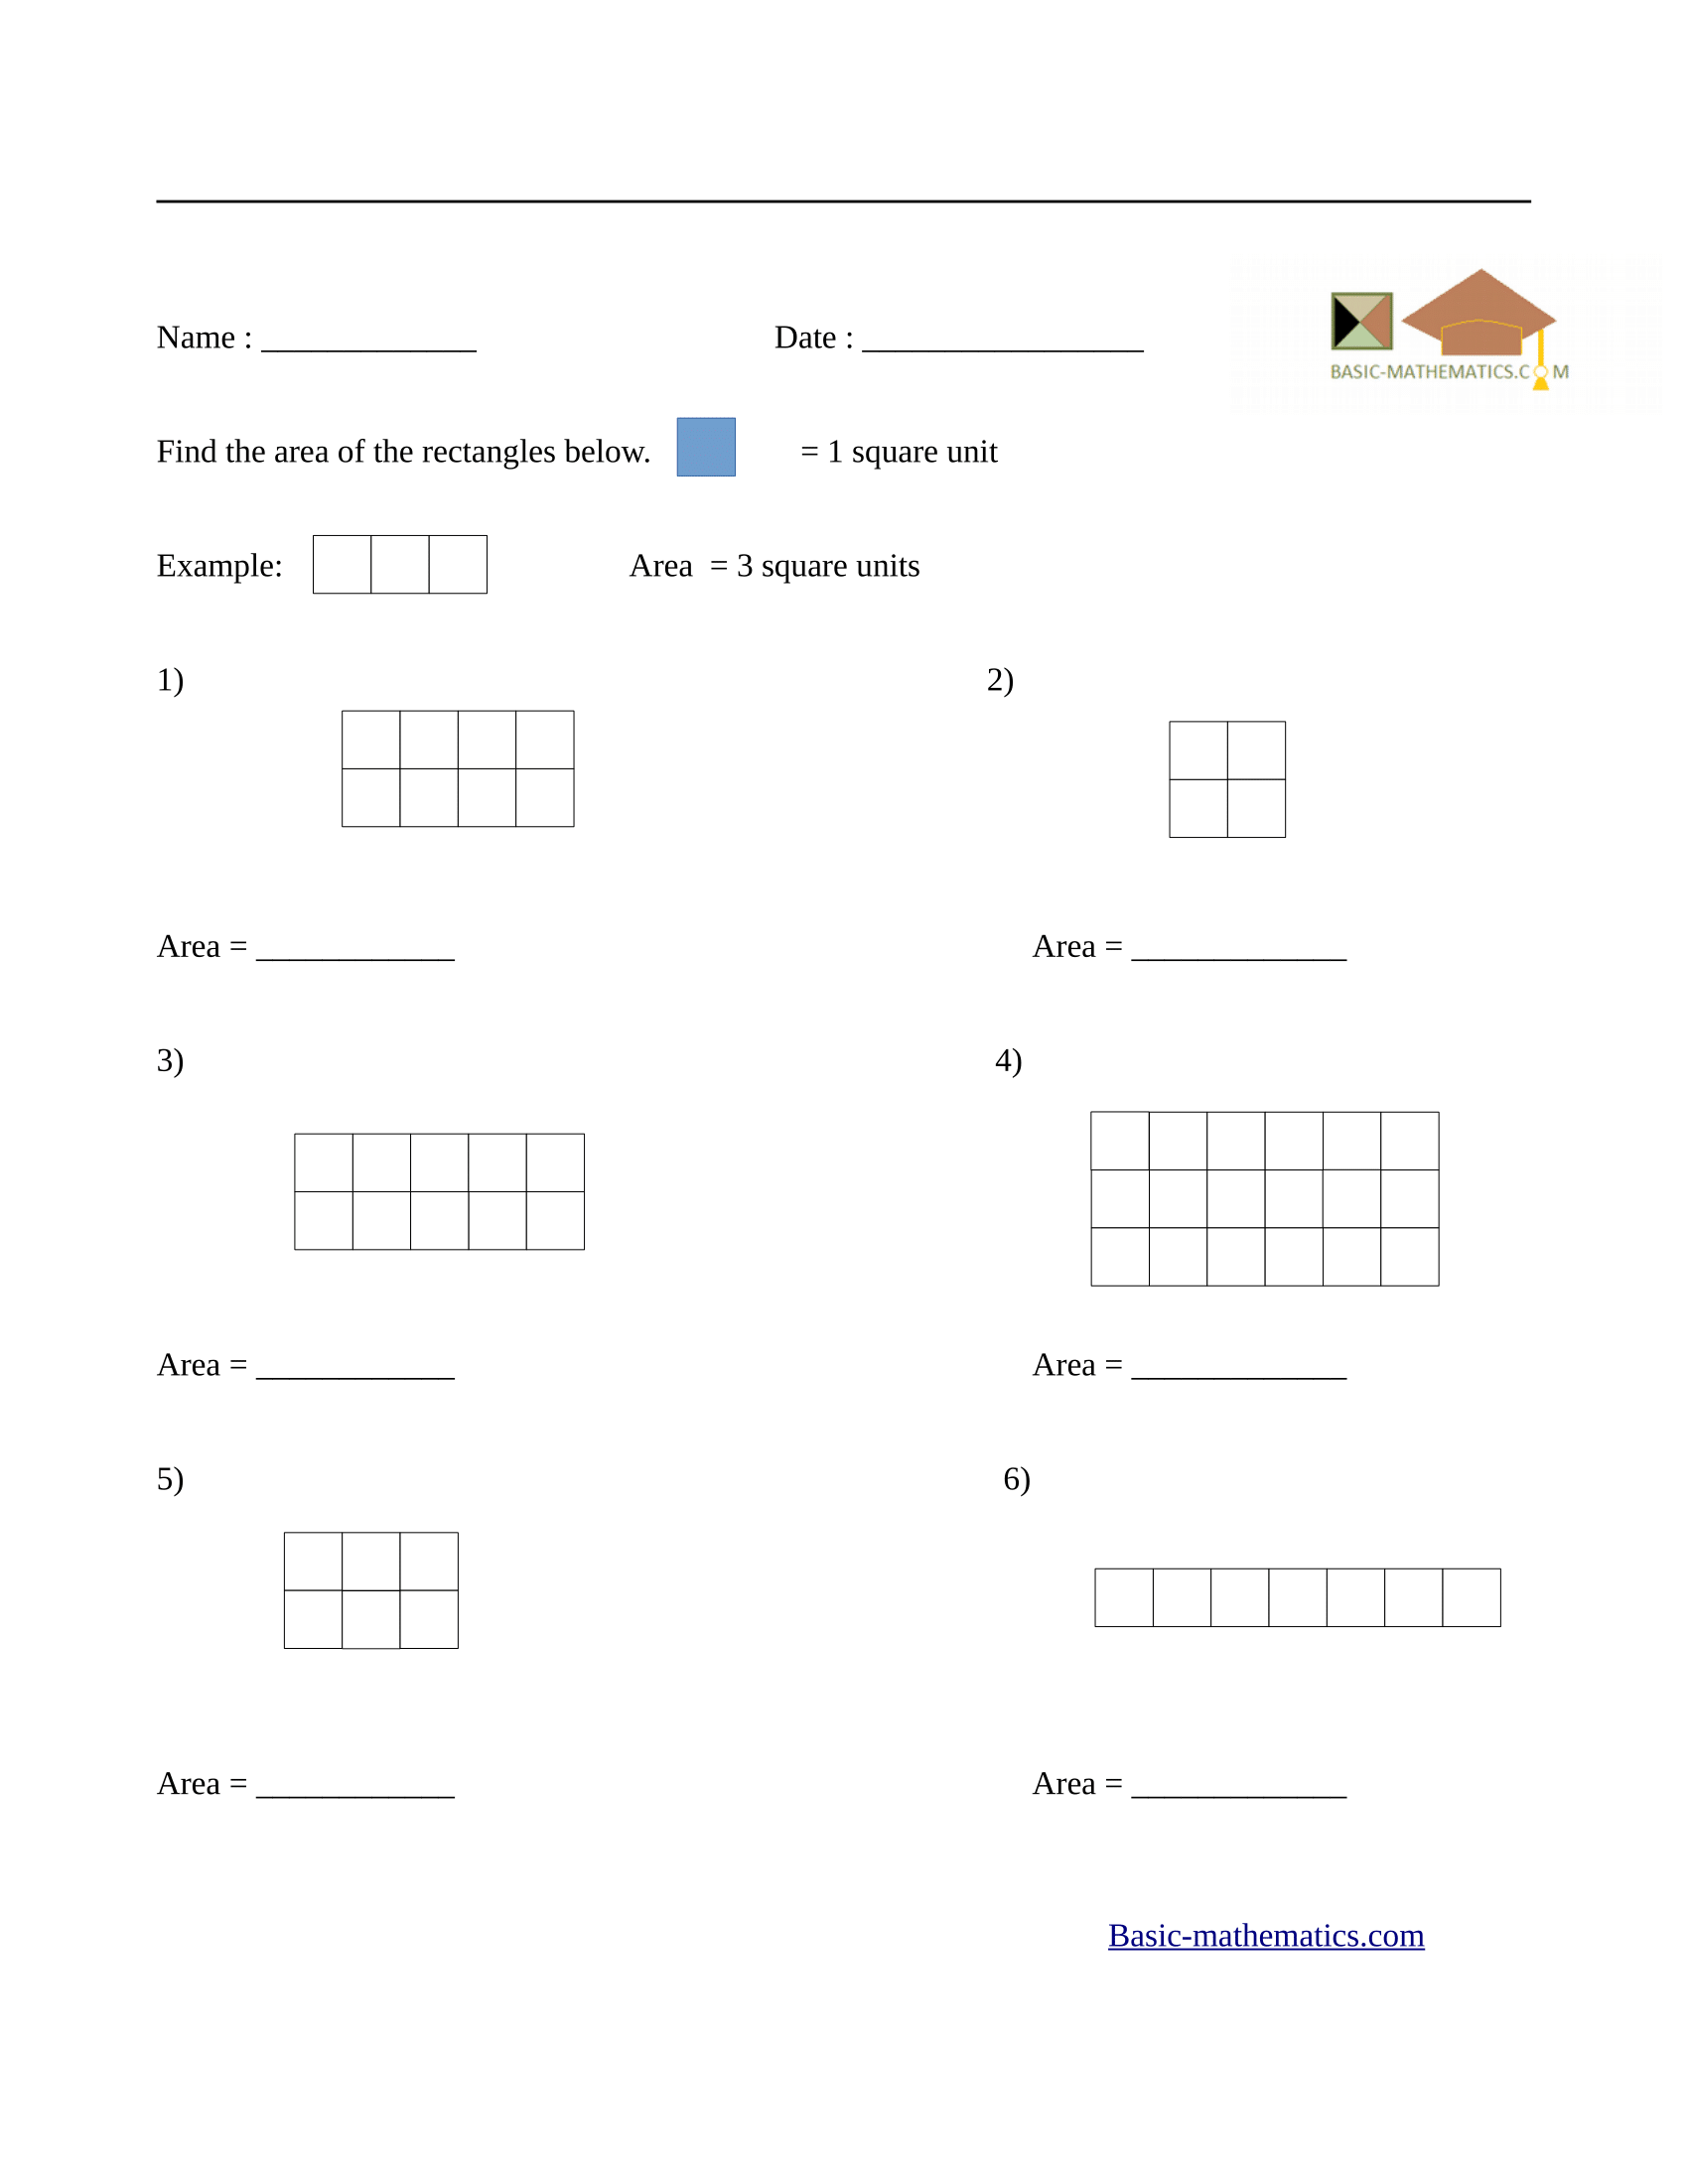 Area of rectangles worksheet 1